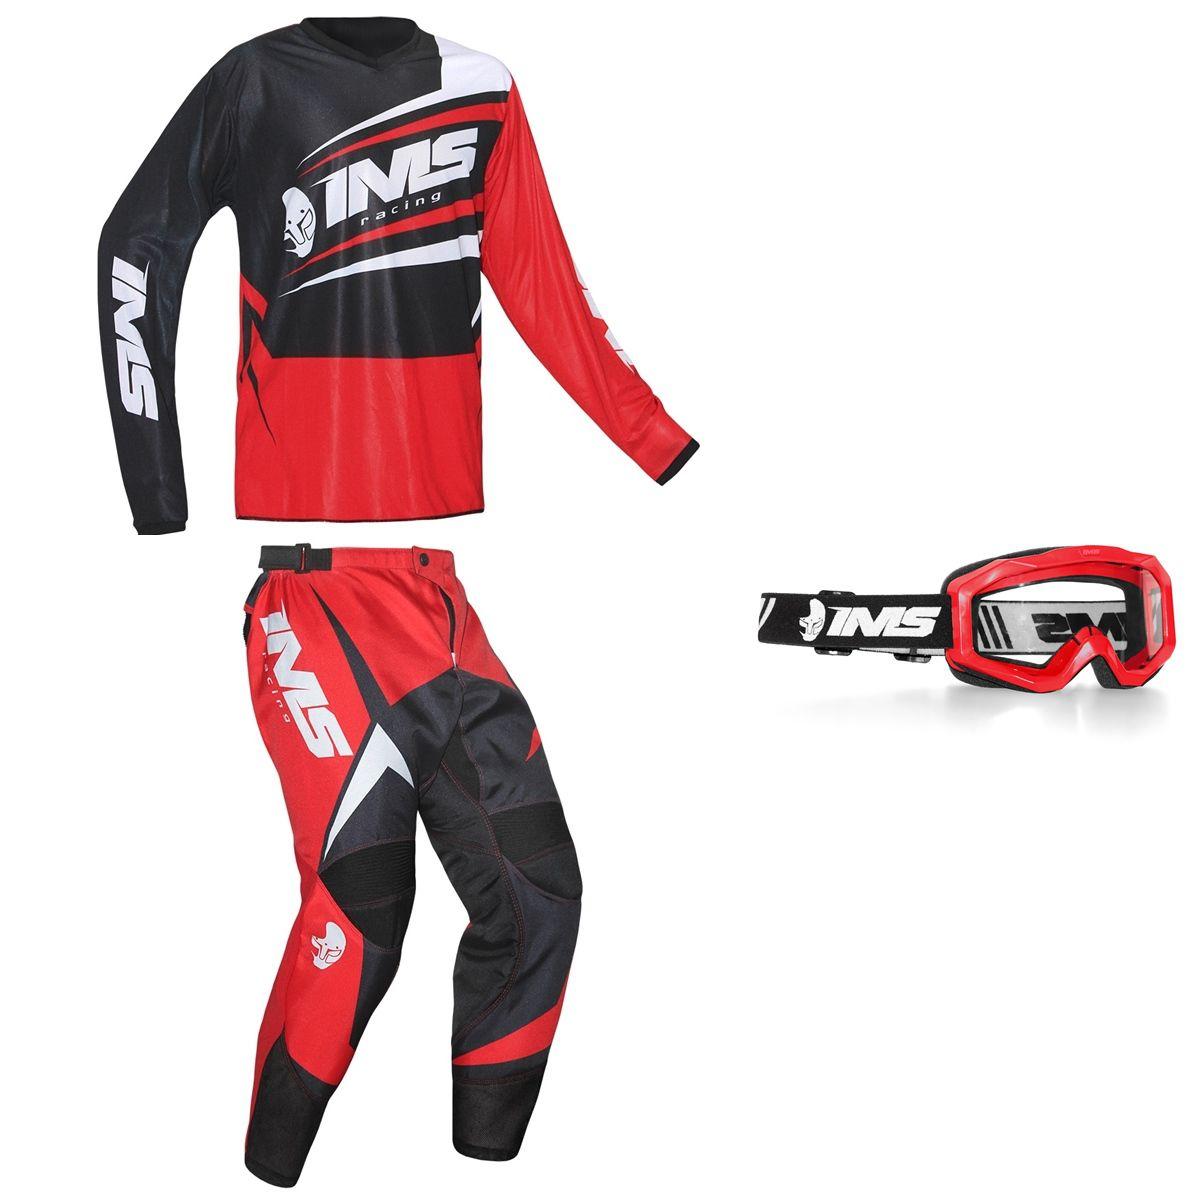 Kit Conjunto Roupa Ims Flex Calça Camisa Óculos Vermelho Trilha Motocross